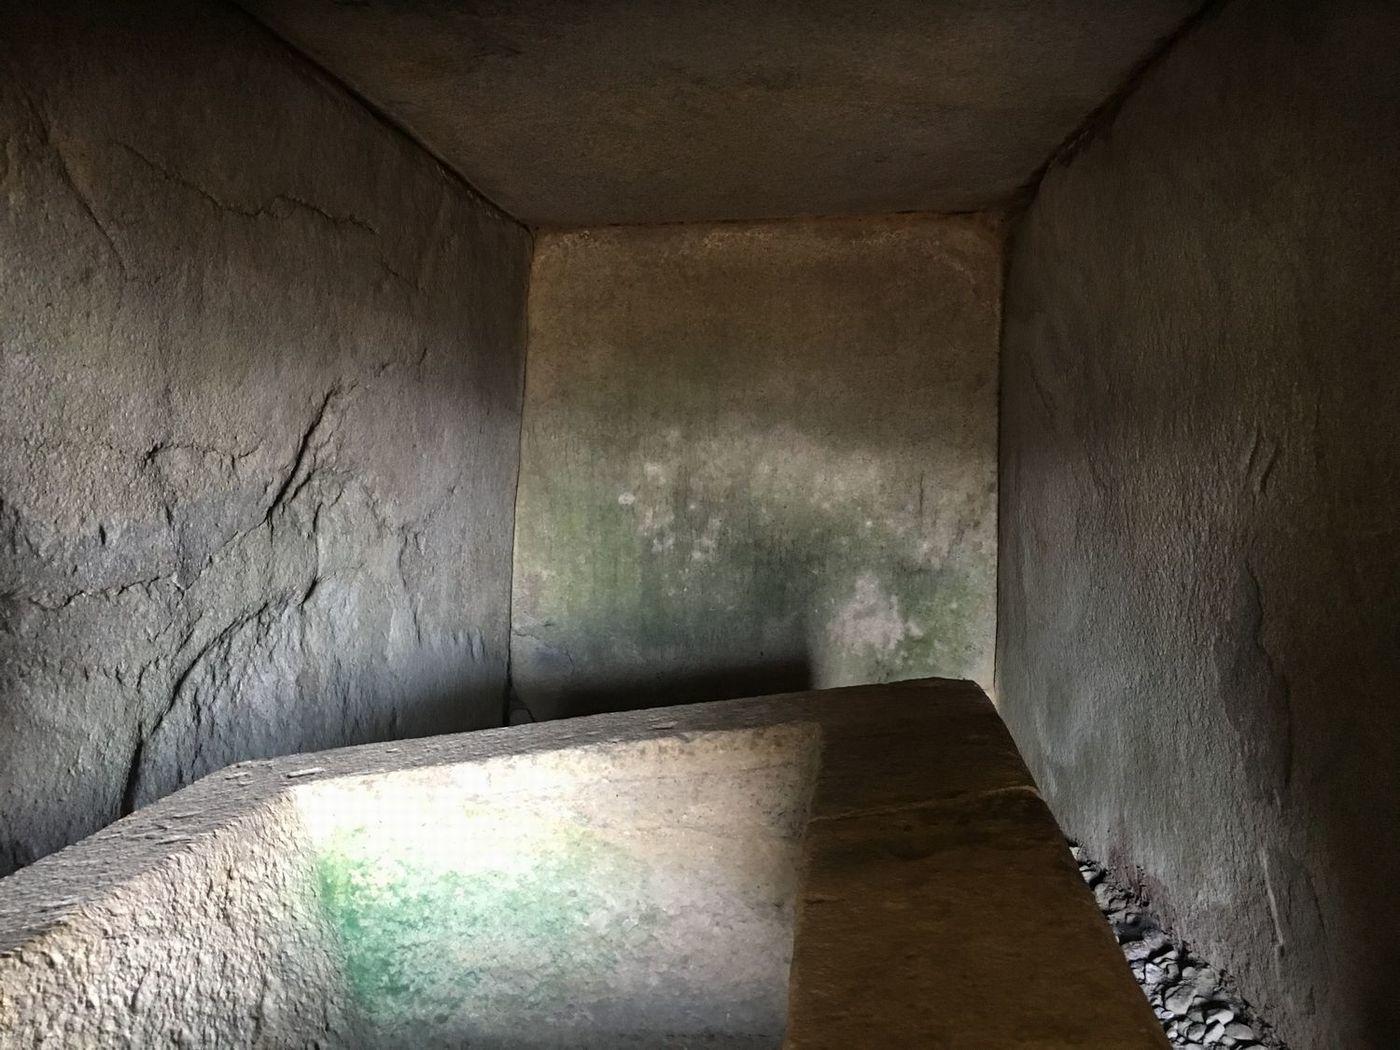 平群の古墳と西宮古墳_a0237937_22332506.jpg